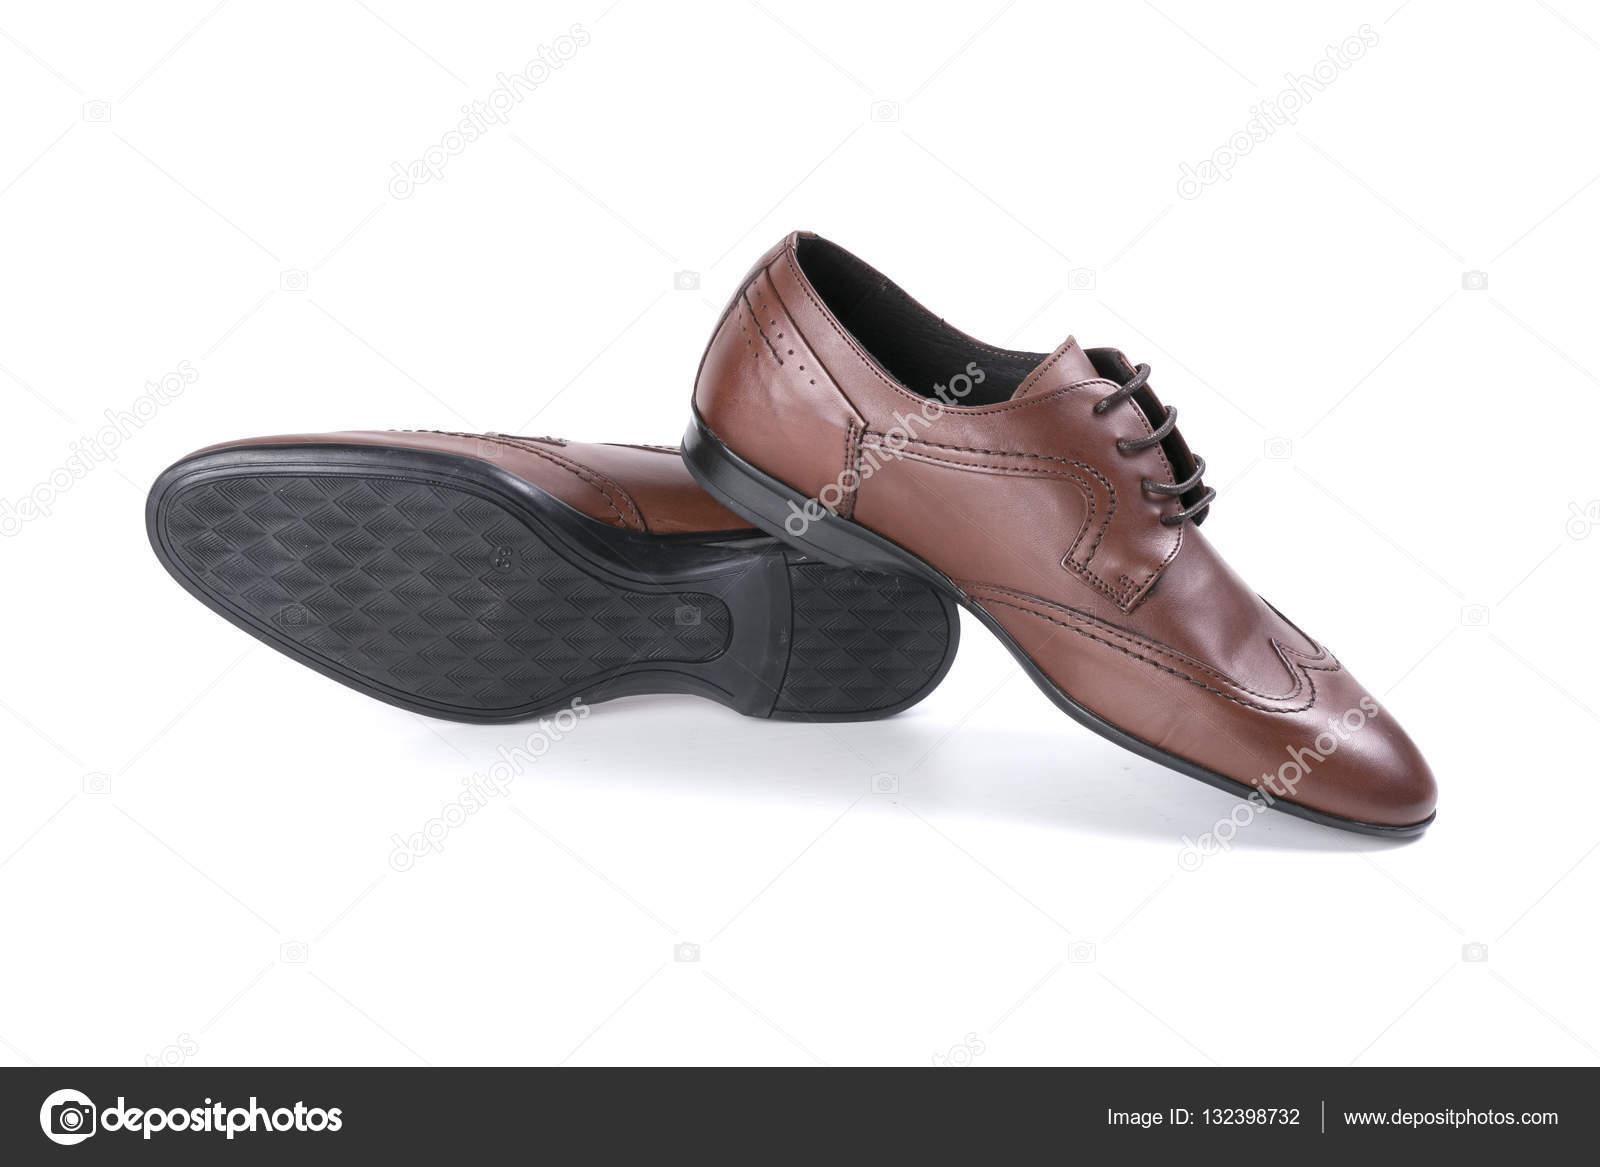 f441952e8c Schuhe Leder braun — Stockfoto © georgevieirasilva #132398732